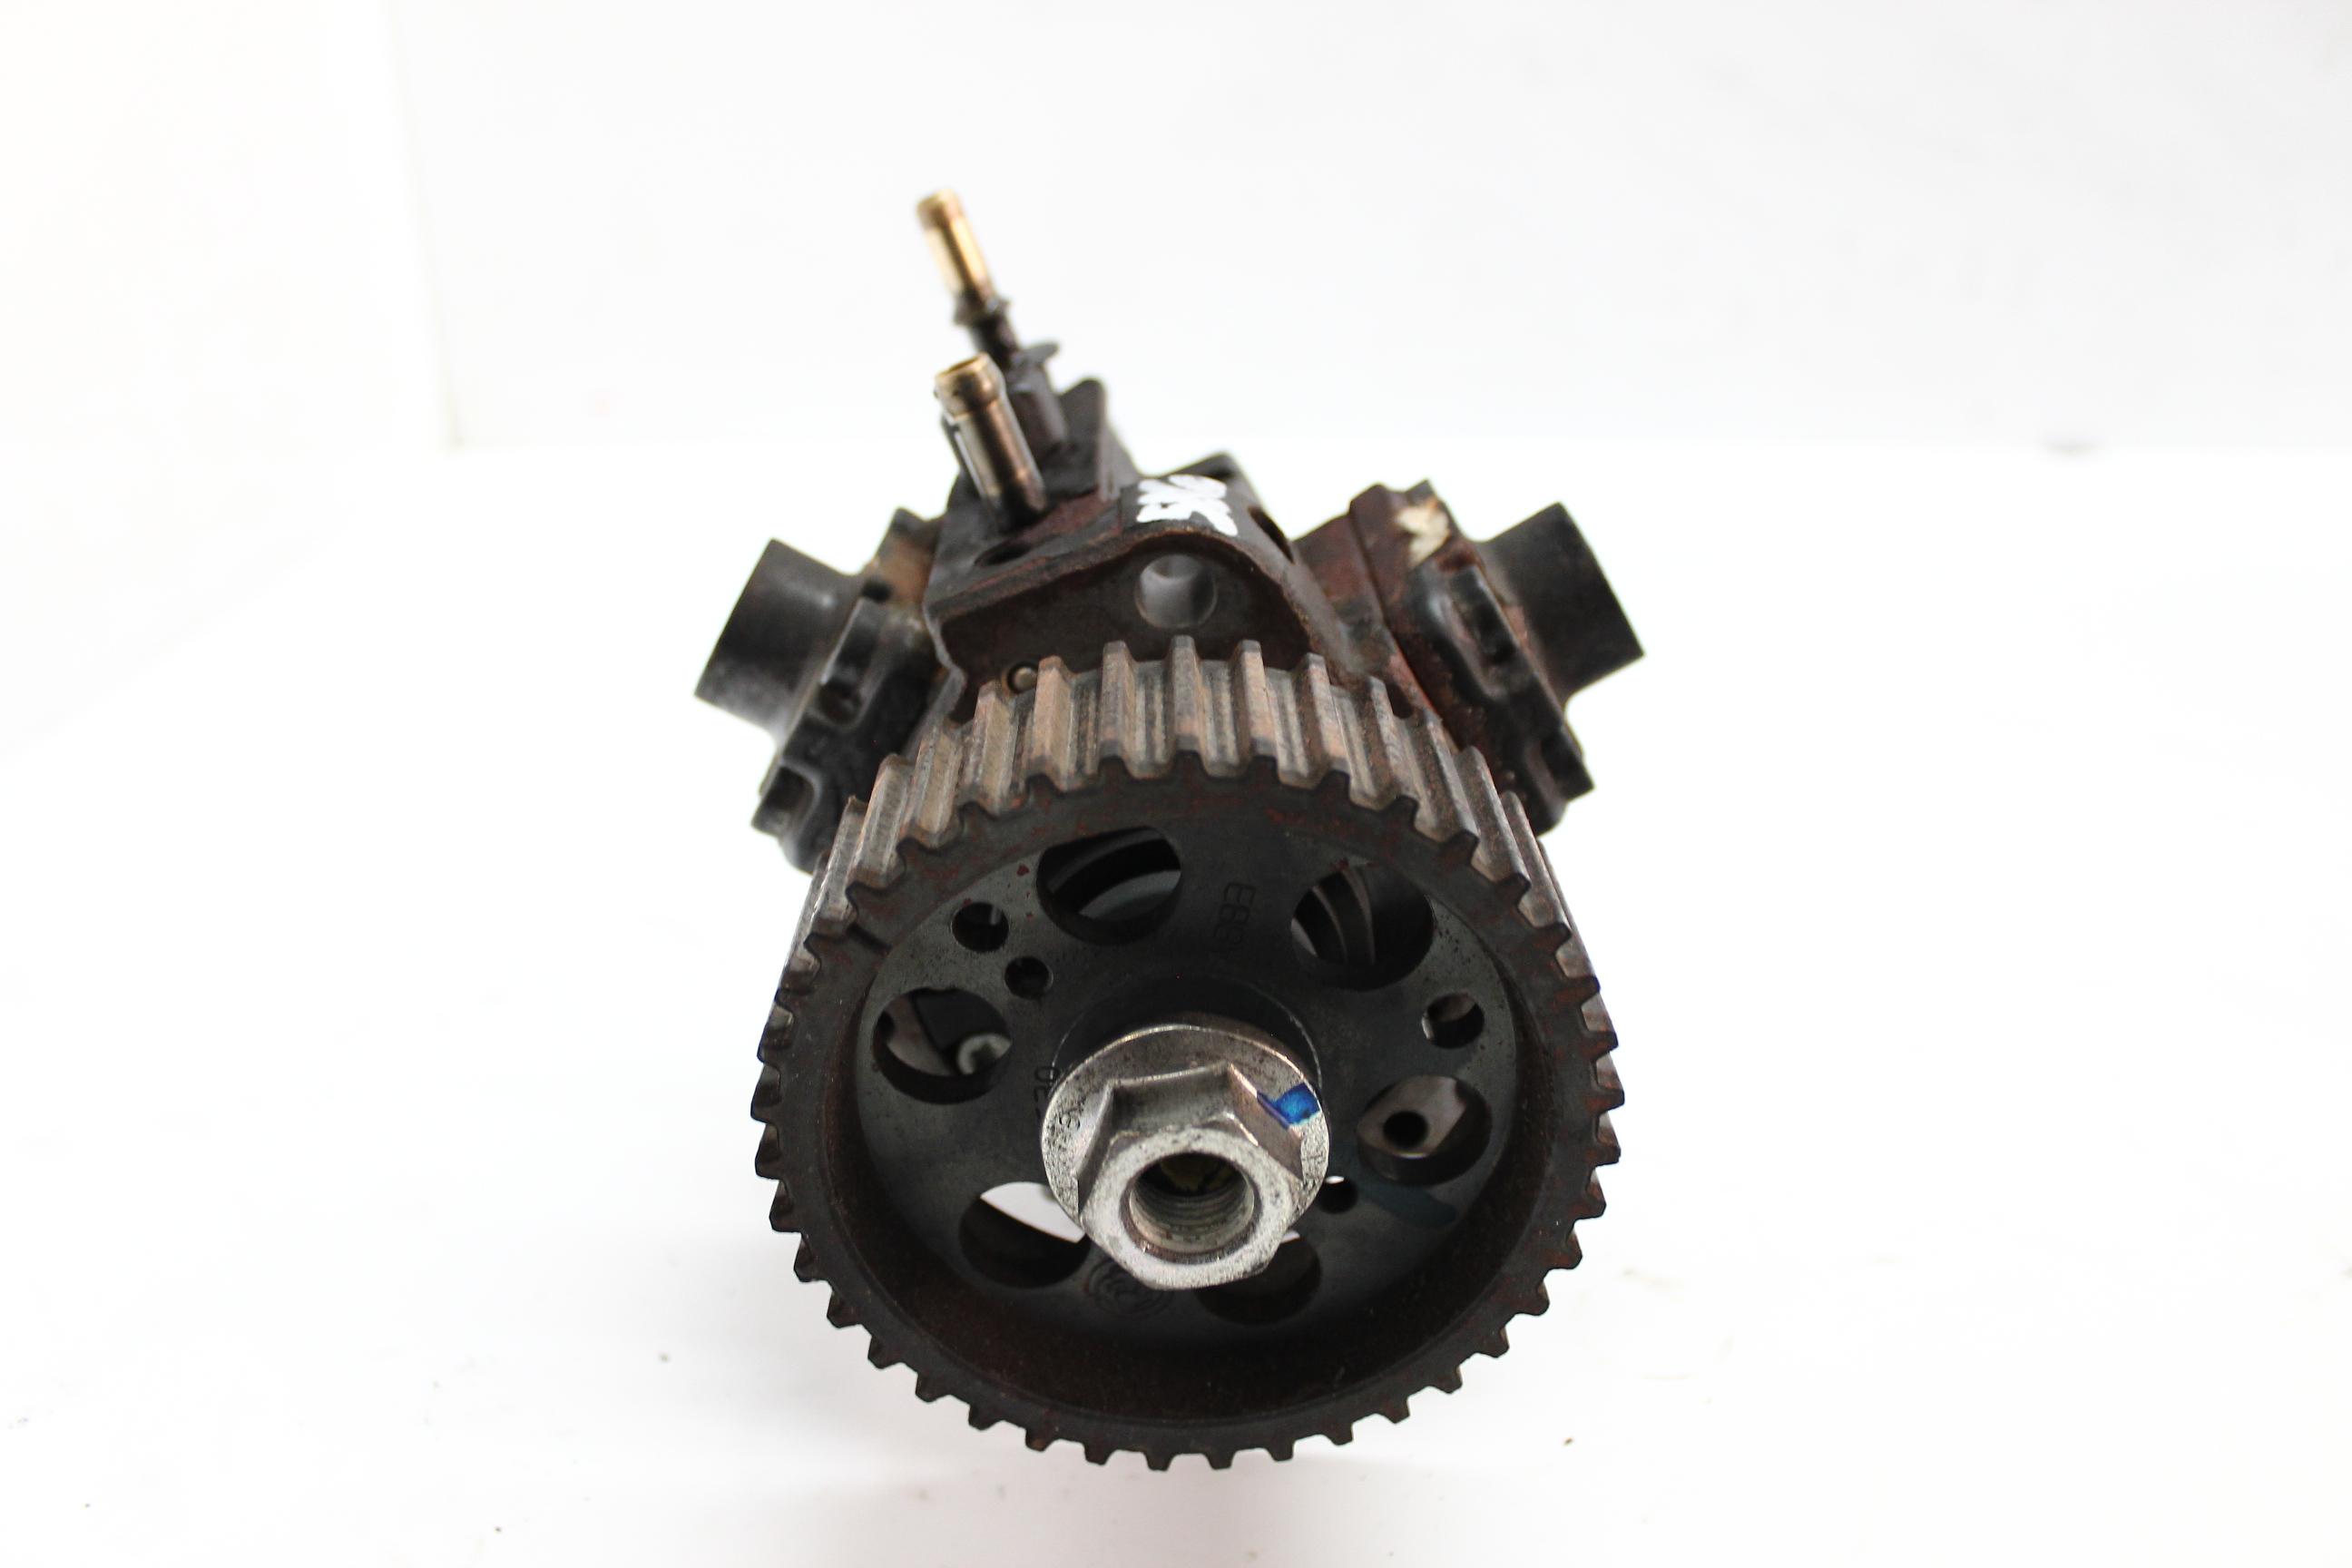 Hochdruckpumpe Alfa Romeo 159 Brera 939 2,4 JTDM 939A9000 55206343